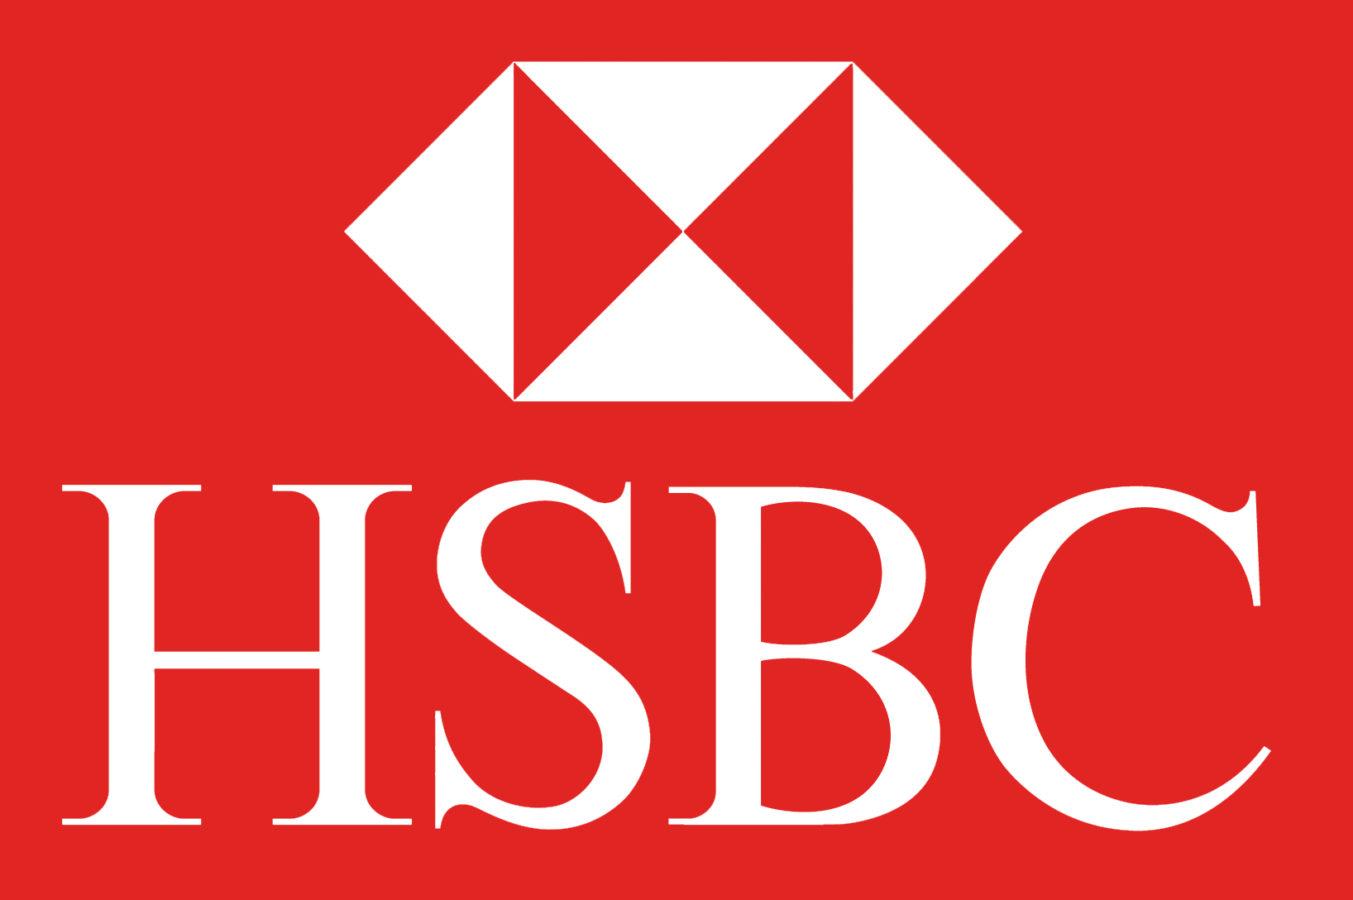 HSBC FRANCE : RESULTATS ANNUELS ET DU SECOND SEMESTRE 2019